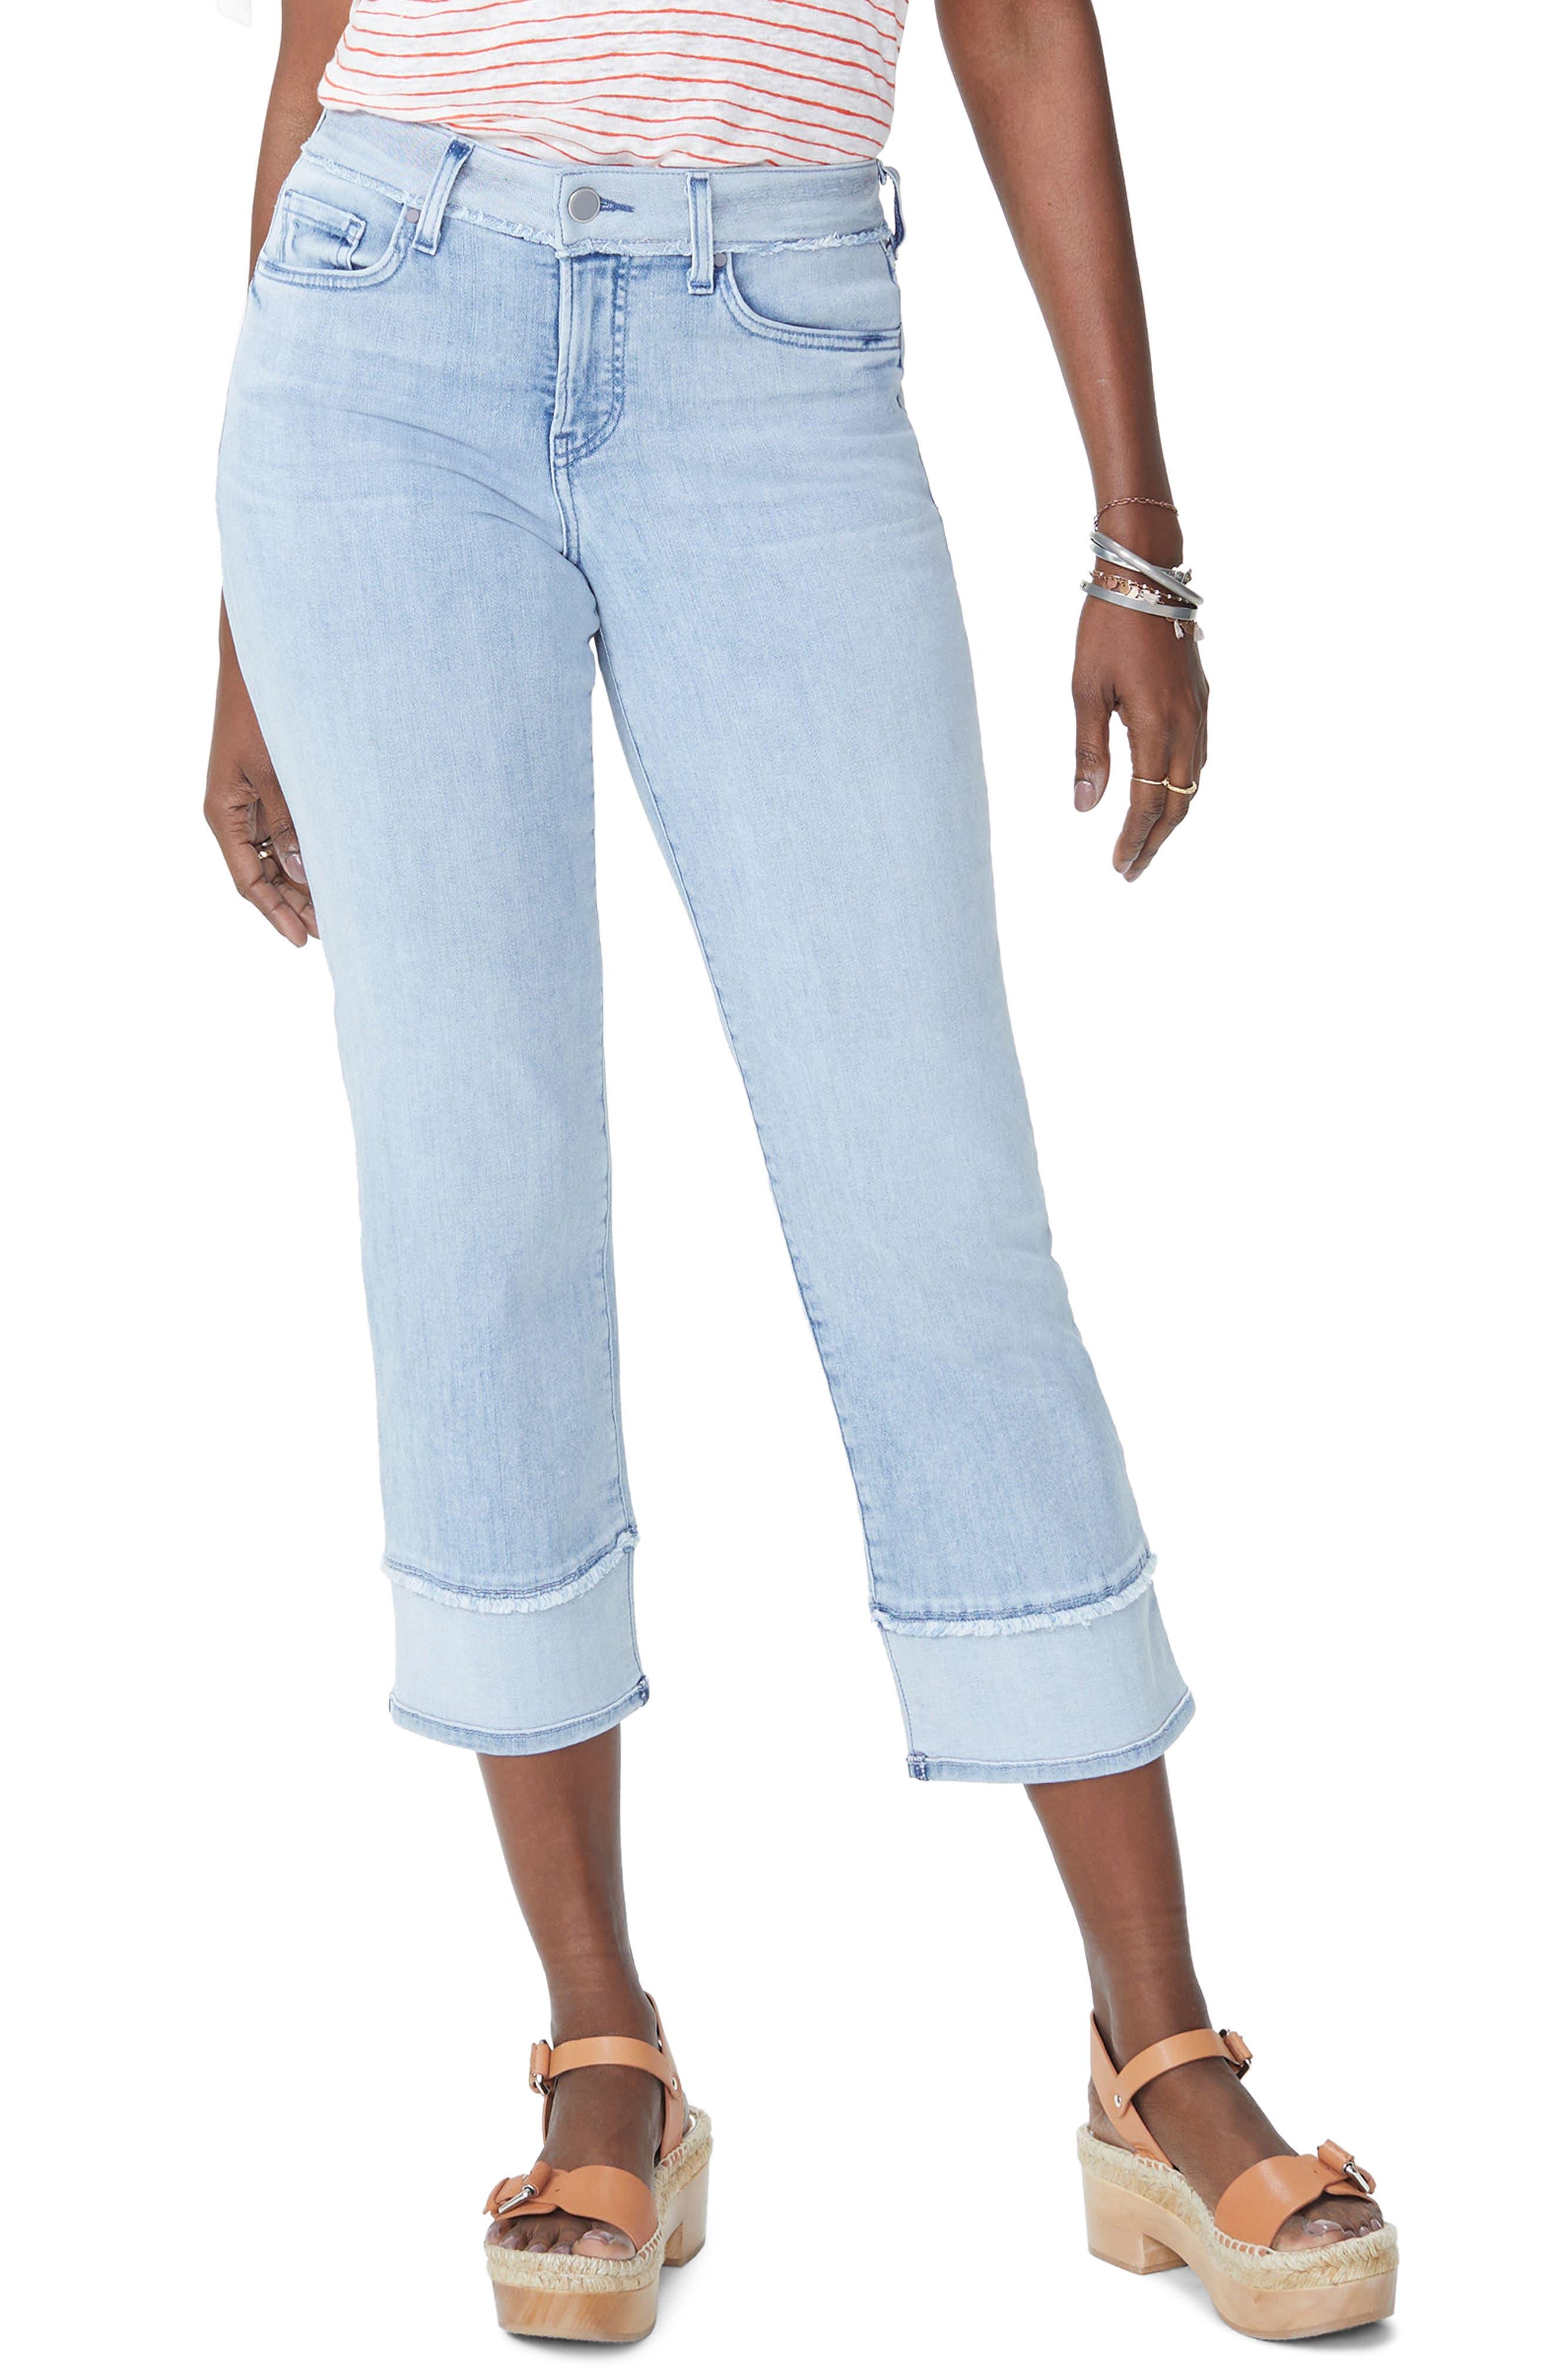 NYDJ Jenna High Waist Straight Leg Reverse Fray Ankle Jeans, Main, color, 421